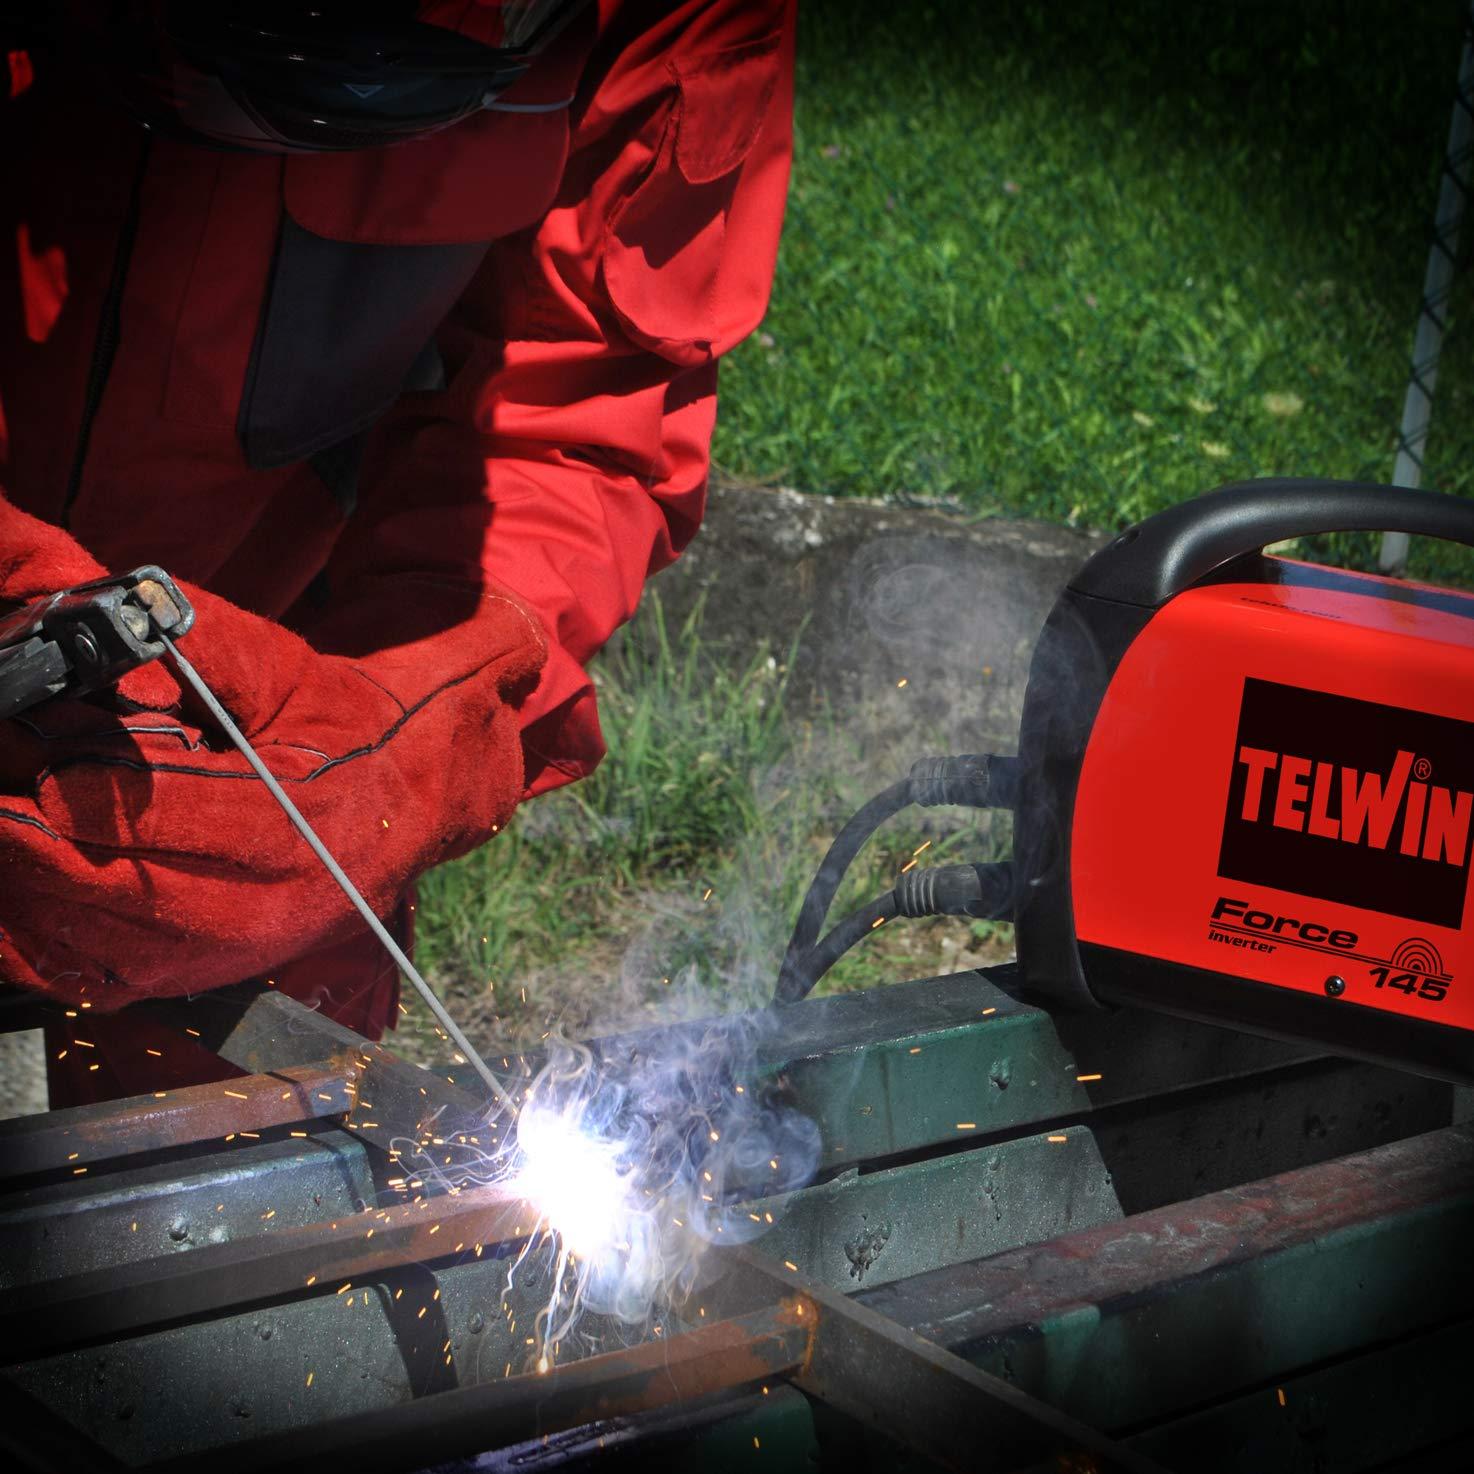 Telwin 7170033 Soldadura Inverter Force 145 125 A.